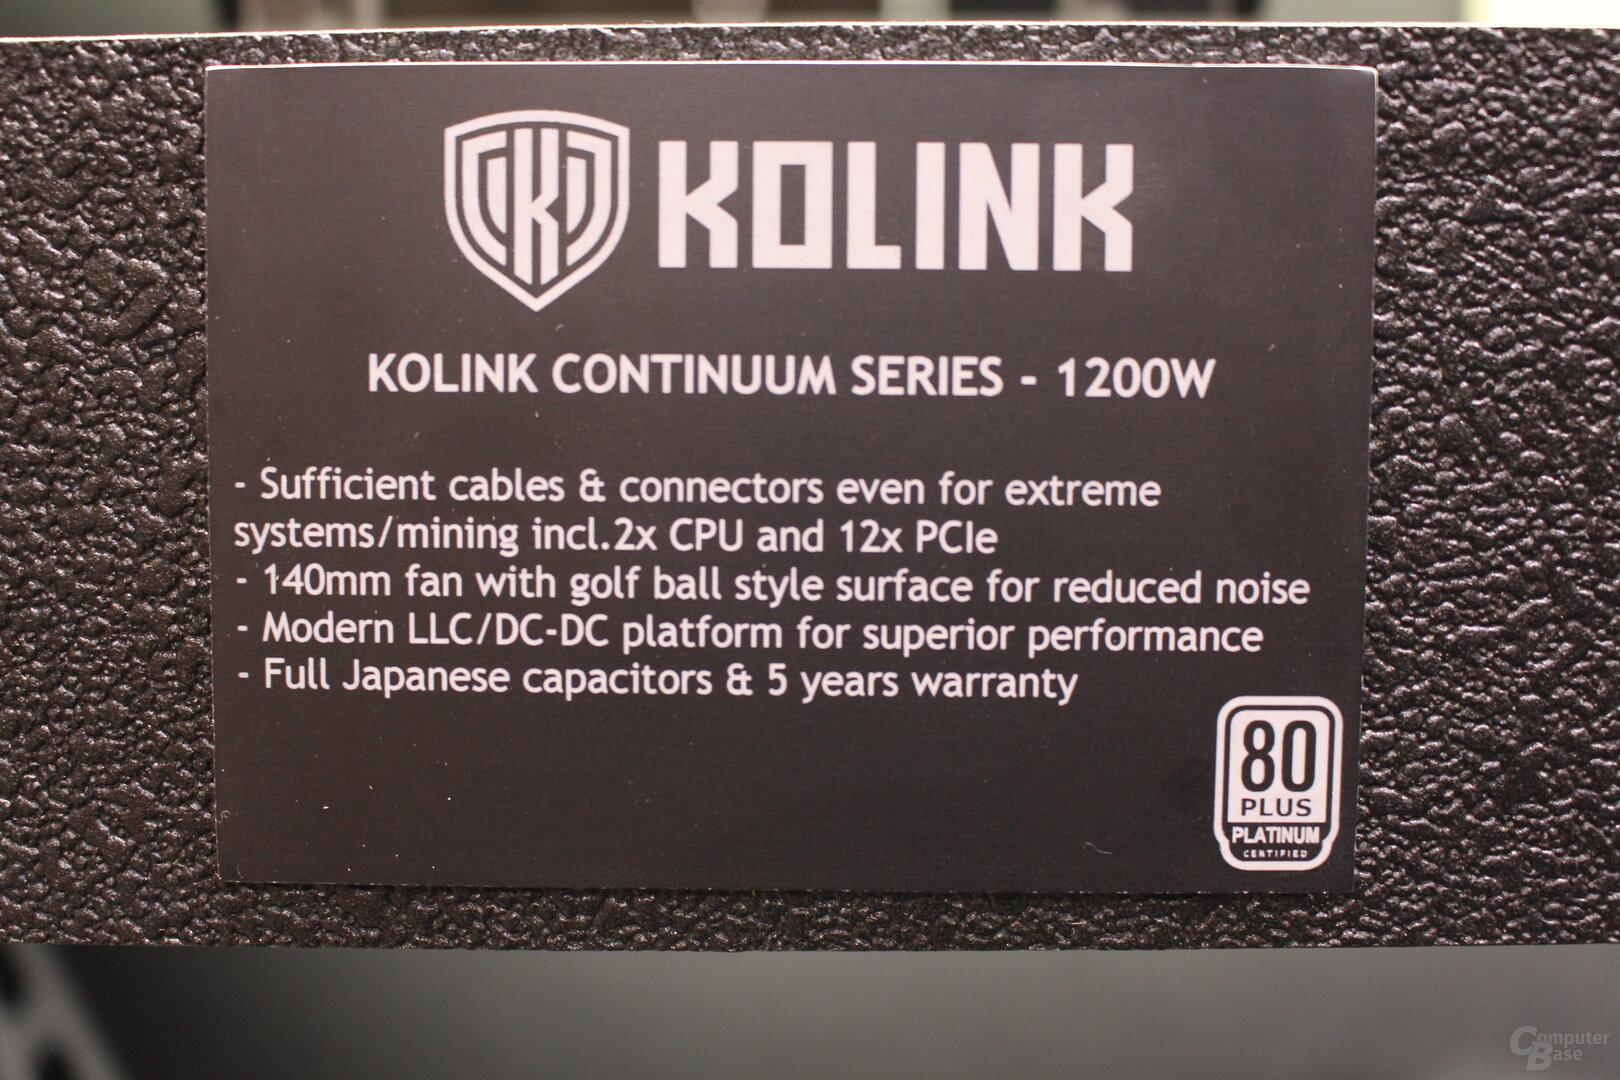 Kolink Continuum 1200W